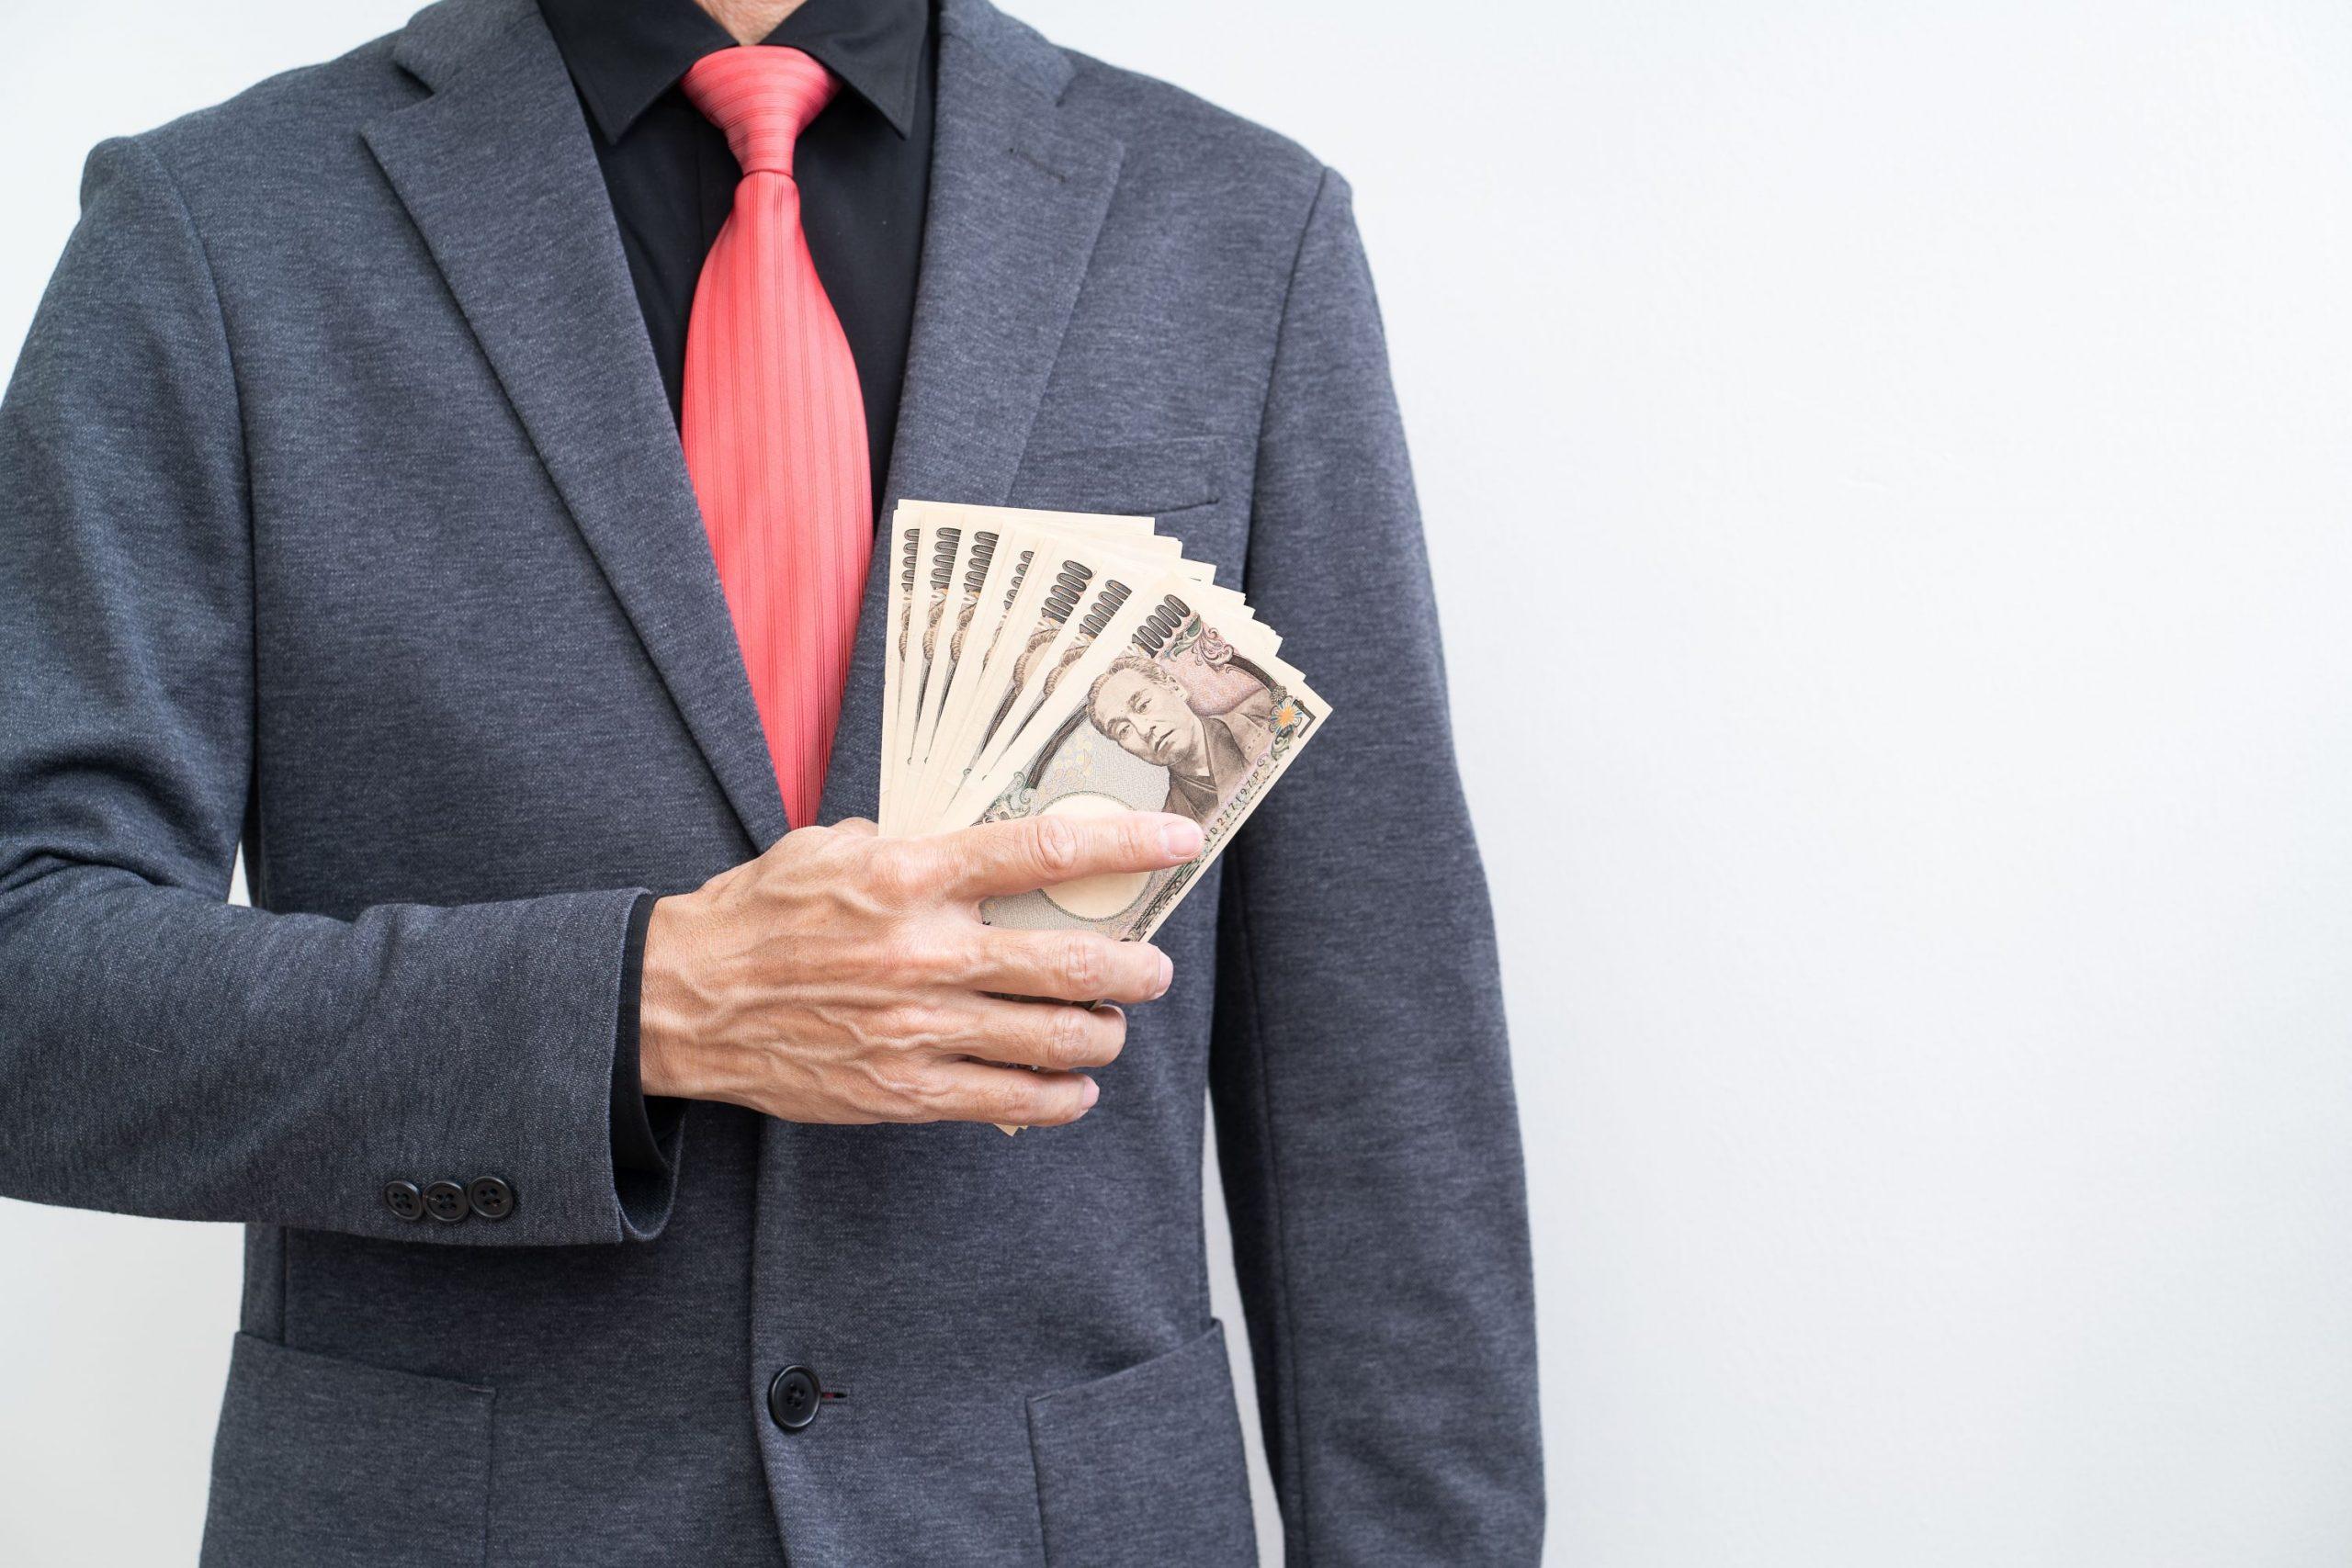 investisseur immobilier pret hypothecaire